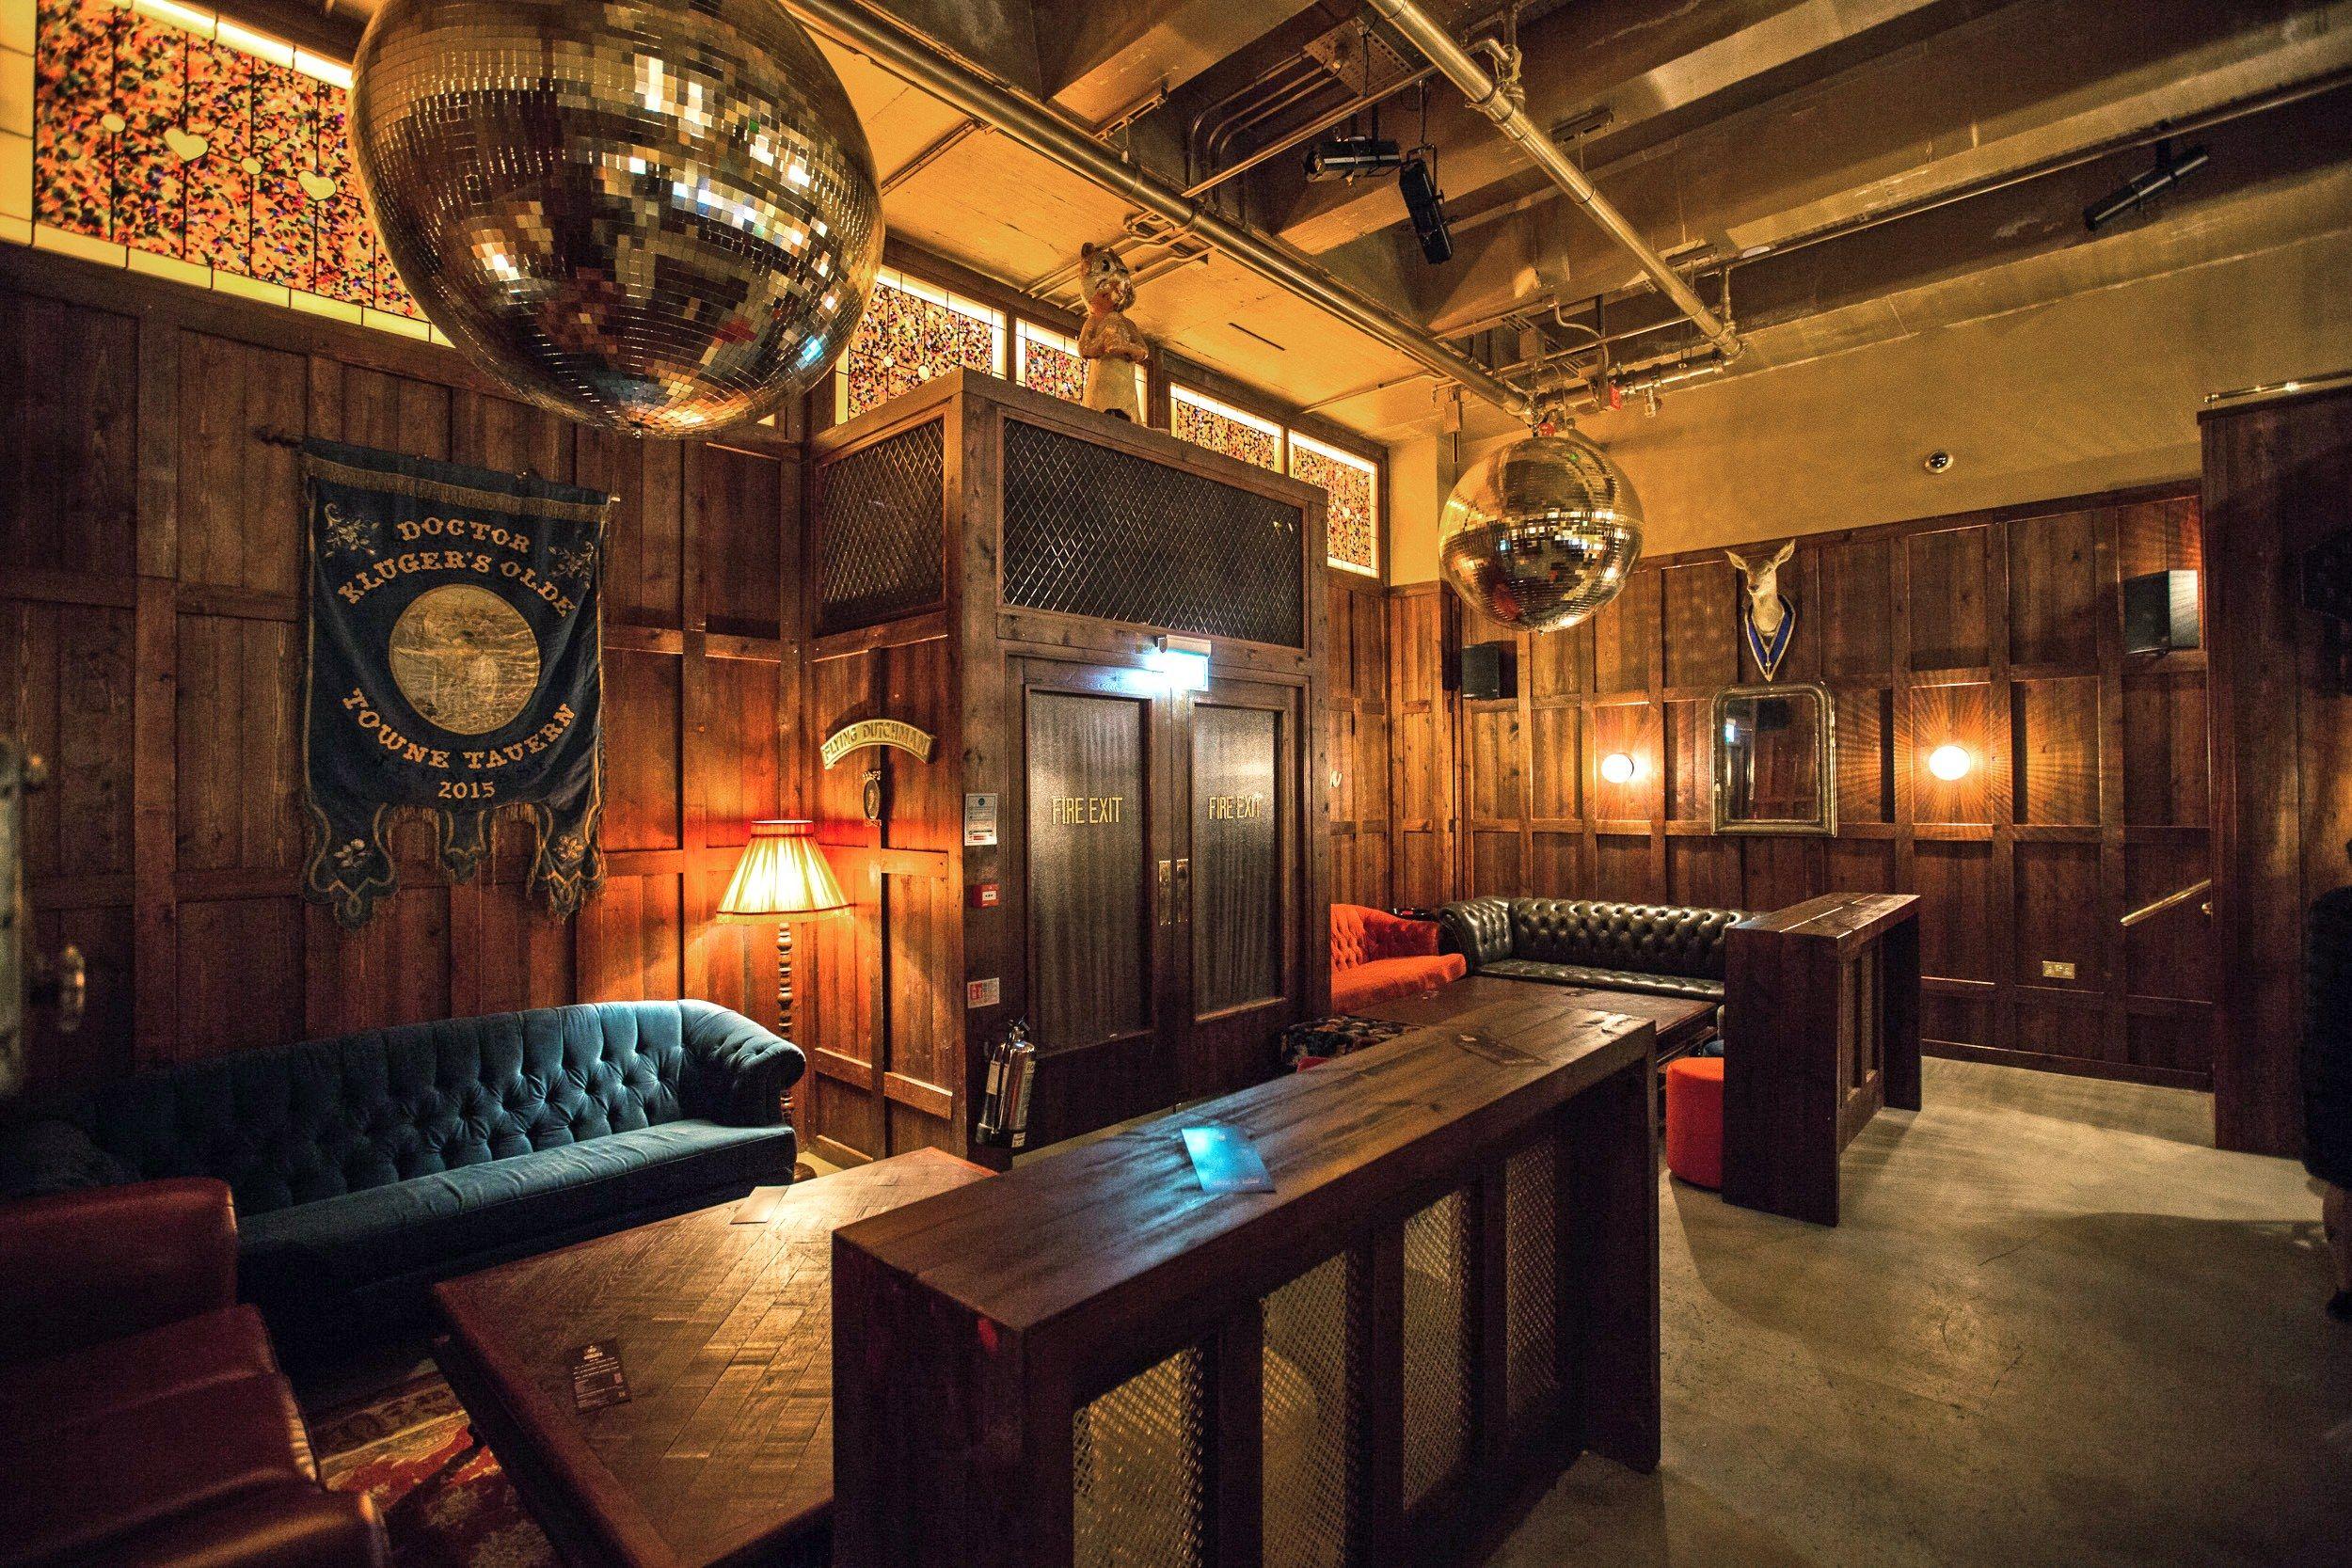 10 Secret Cocktail Bars In London - Architectural Digest